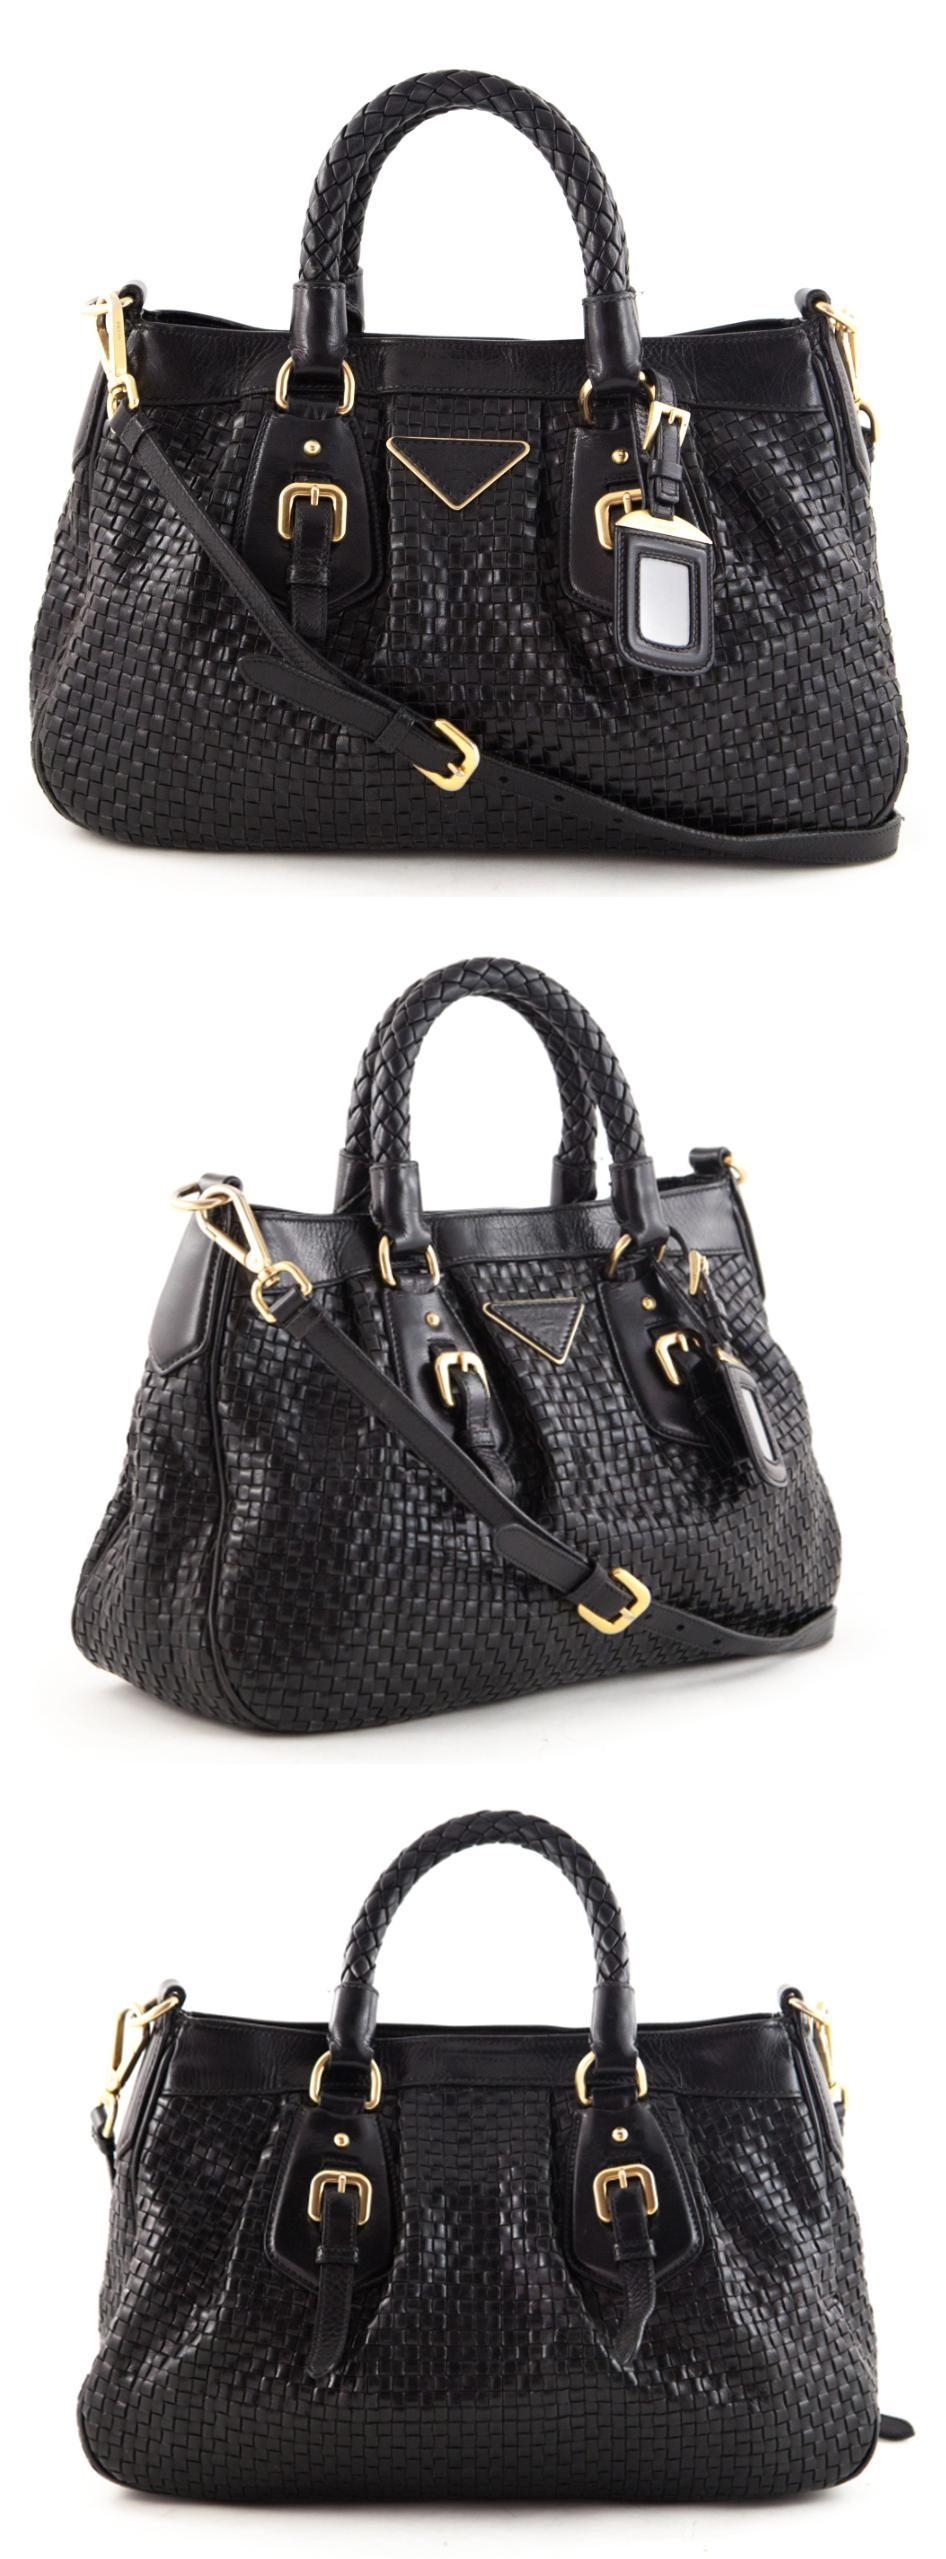 Prada satchel bag in black pebbled calfskin with gold hardware ...